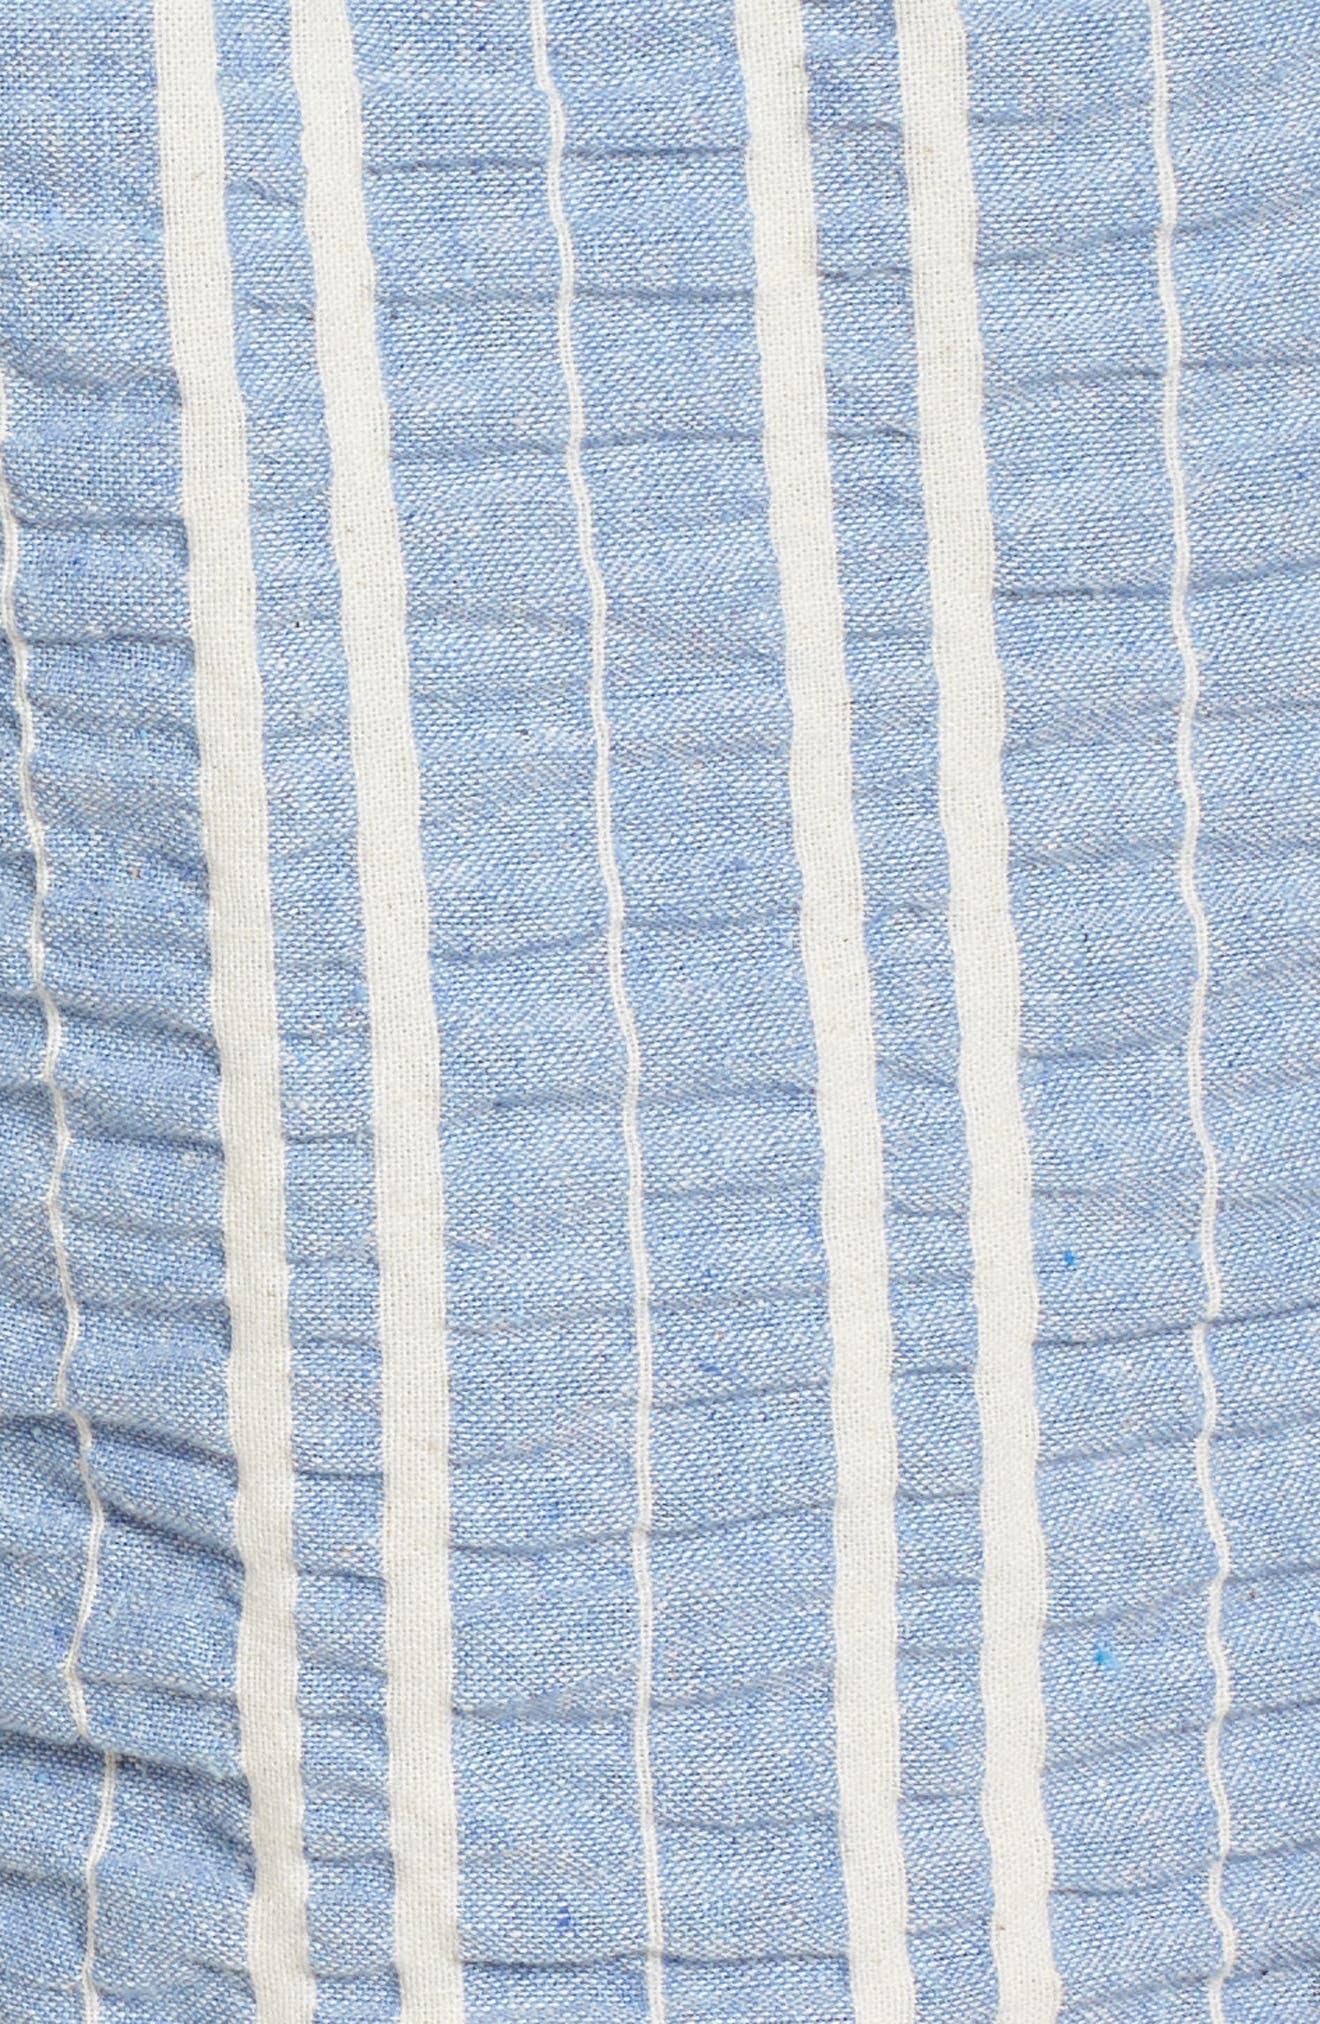 LOST + WANDER, Waves Stripe Tie Front Romper, Alternate thumbnail 5, color, 466